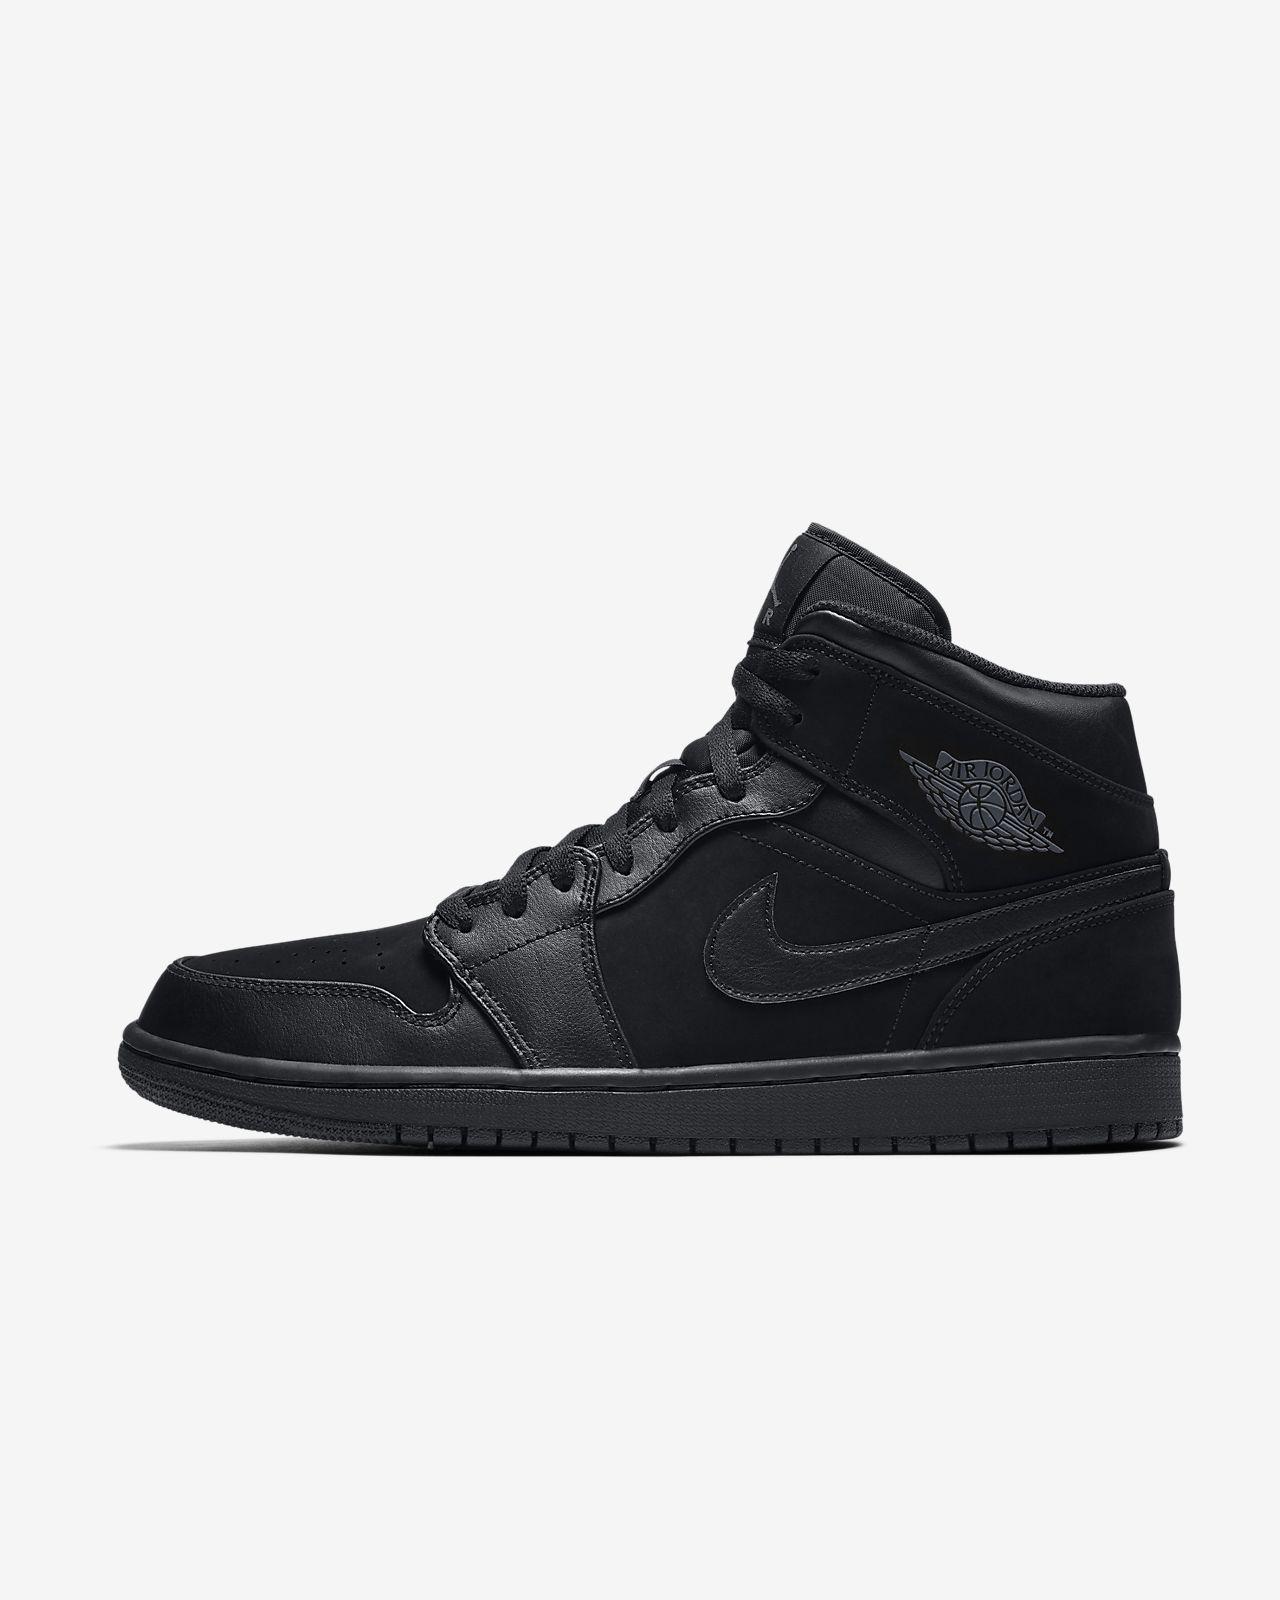 7dddec9f256e Air Jordan 1 Mid férficipő. Nike.com HU